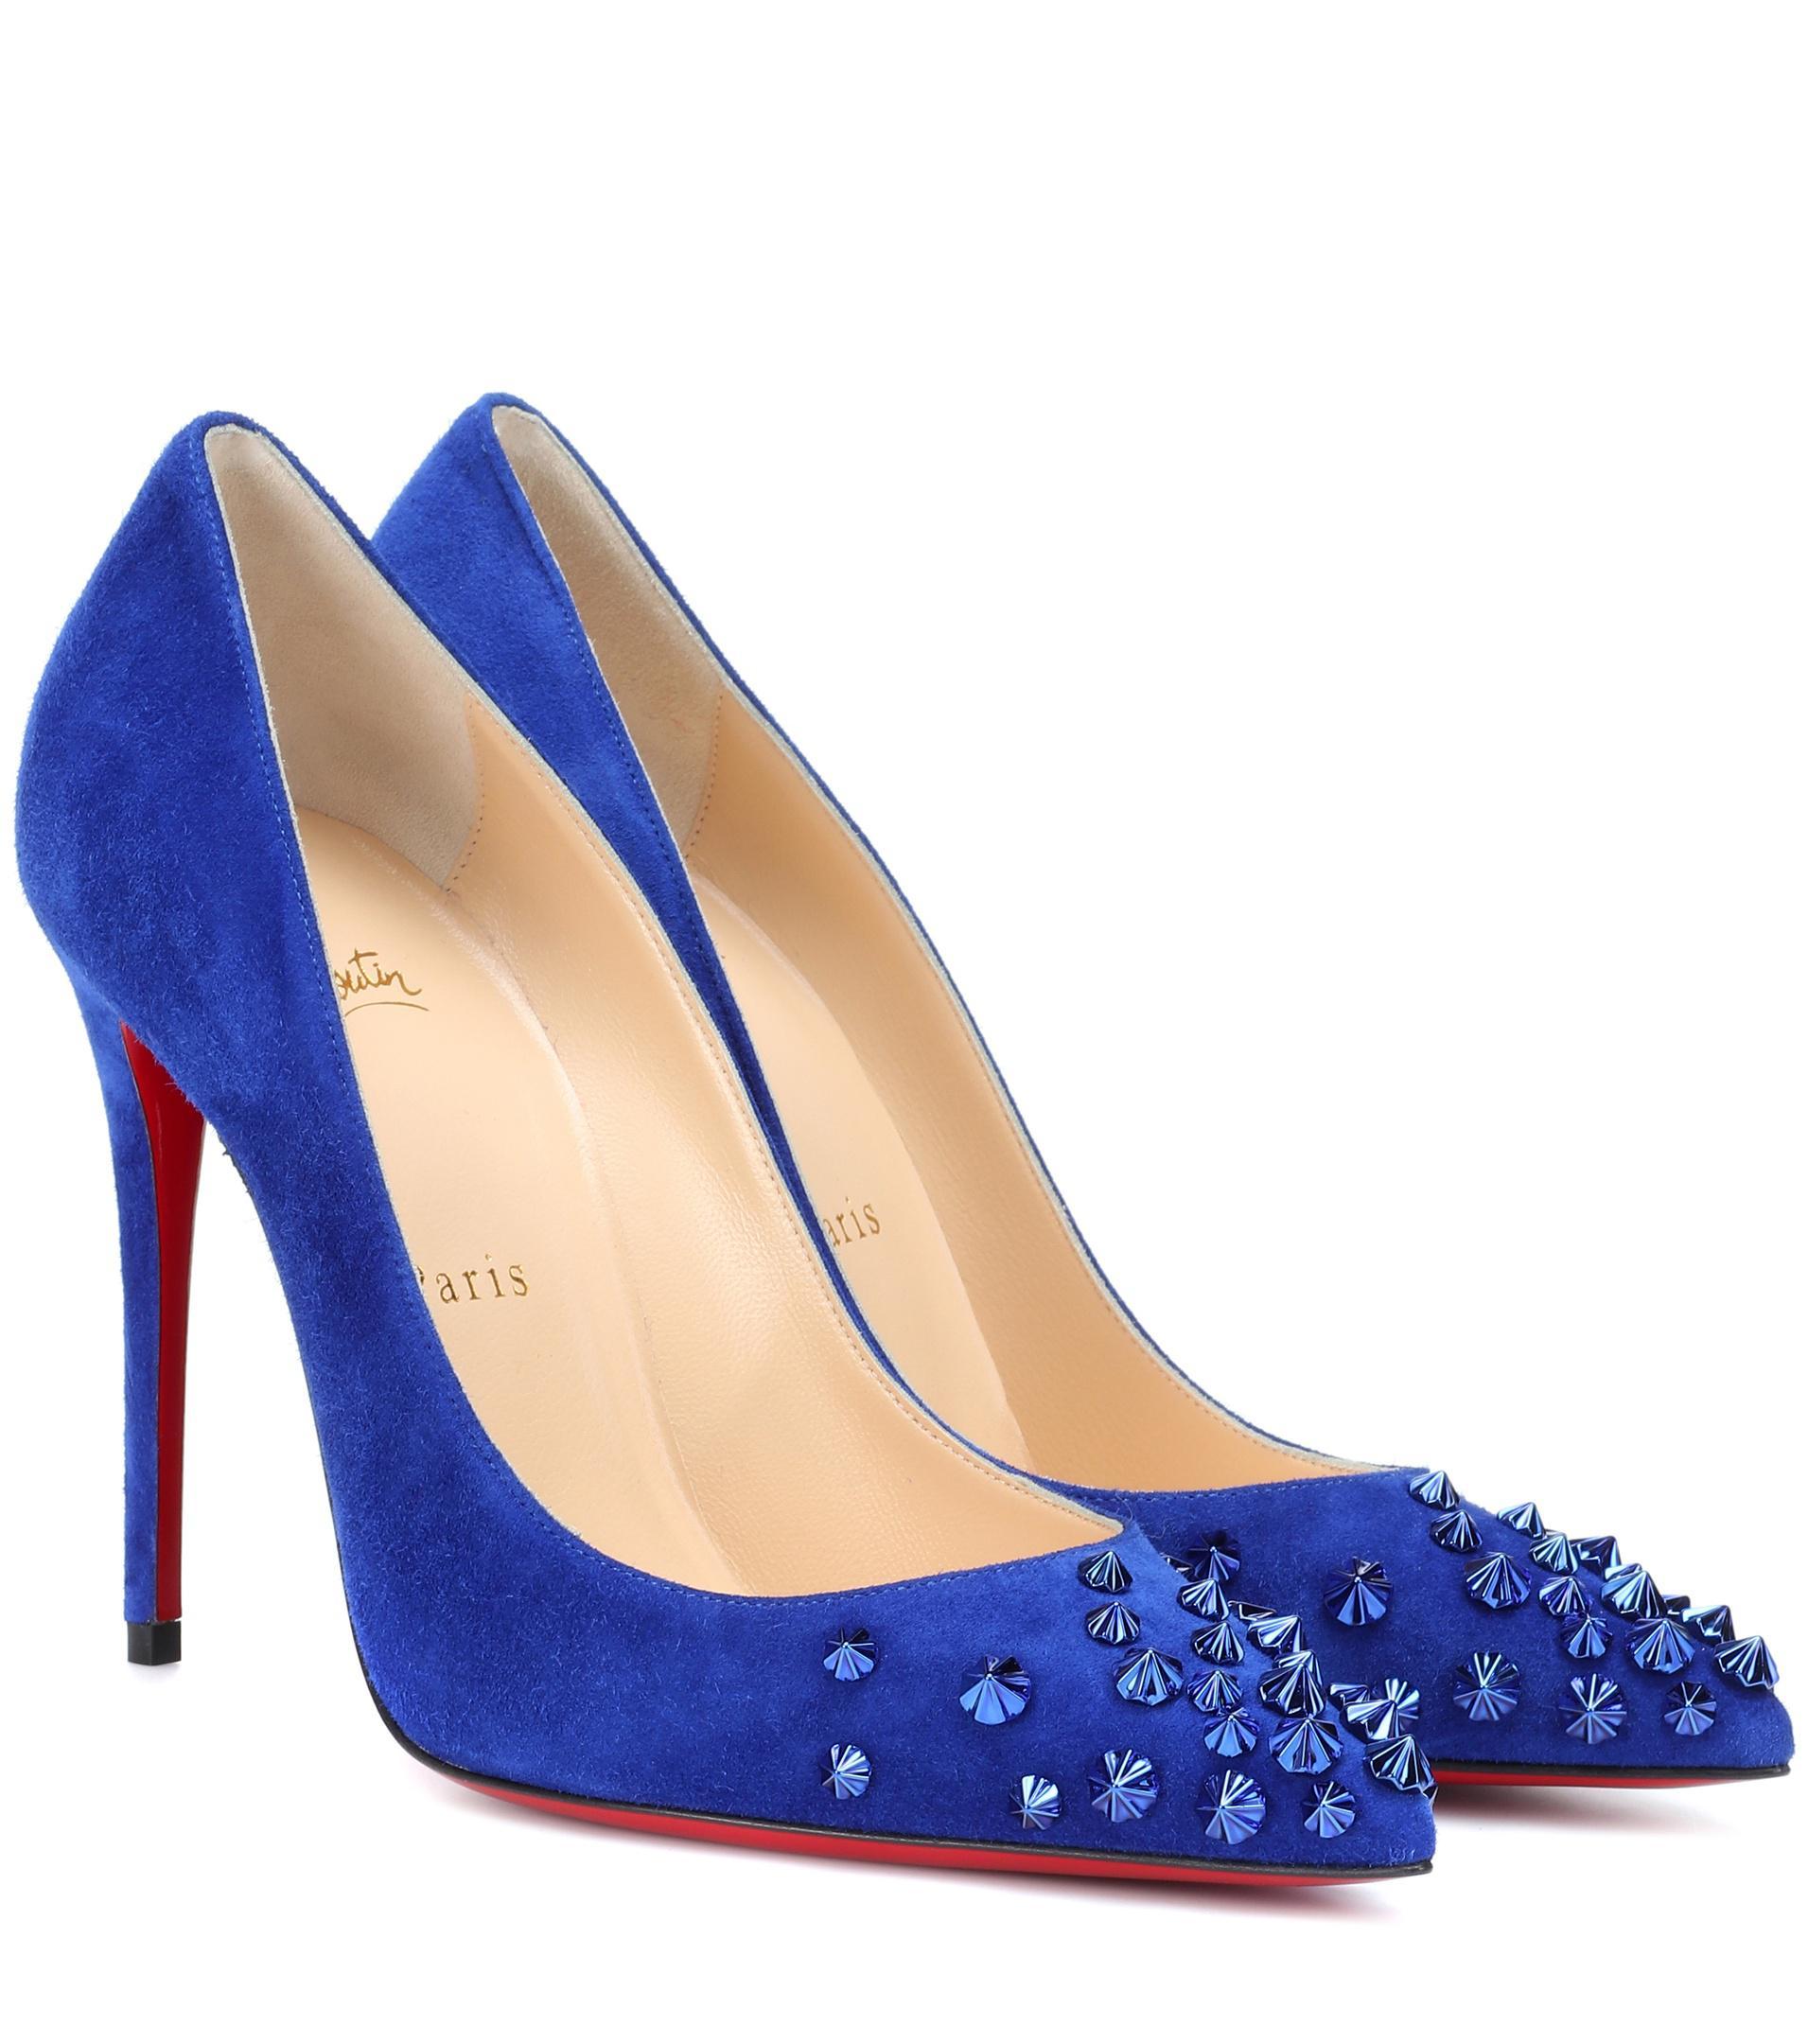 61626050ff4 Women's Blue Drama 100 Suede Pumps